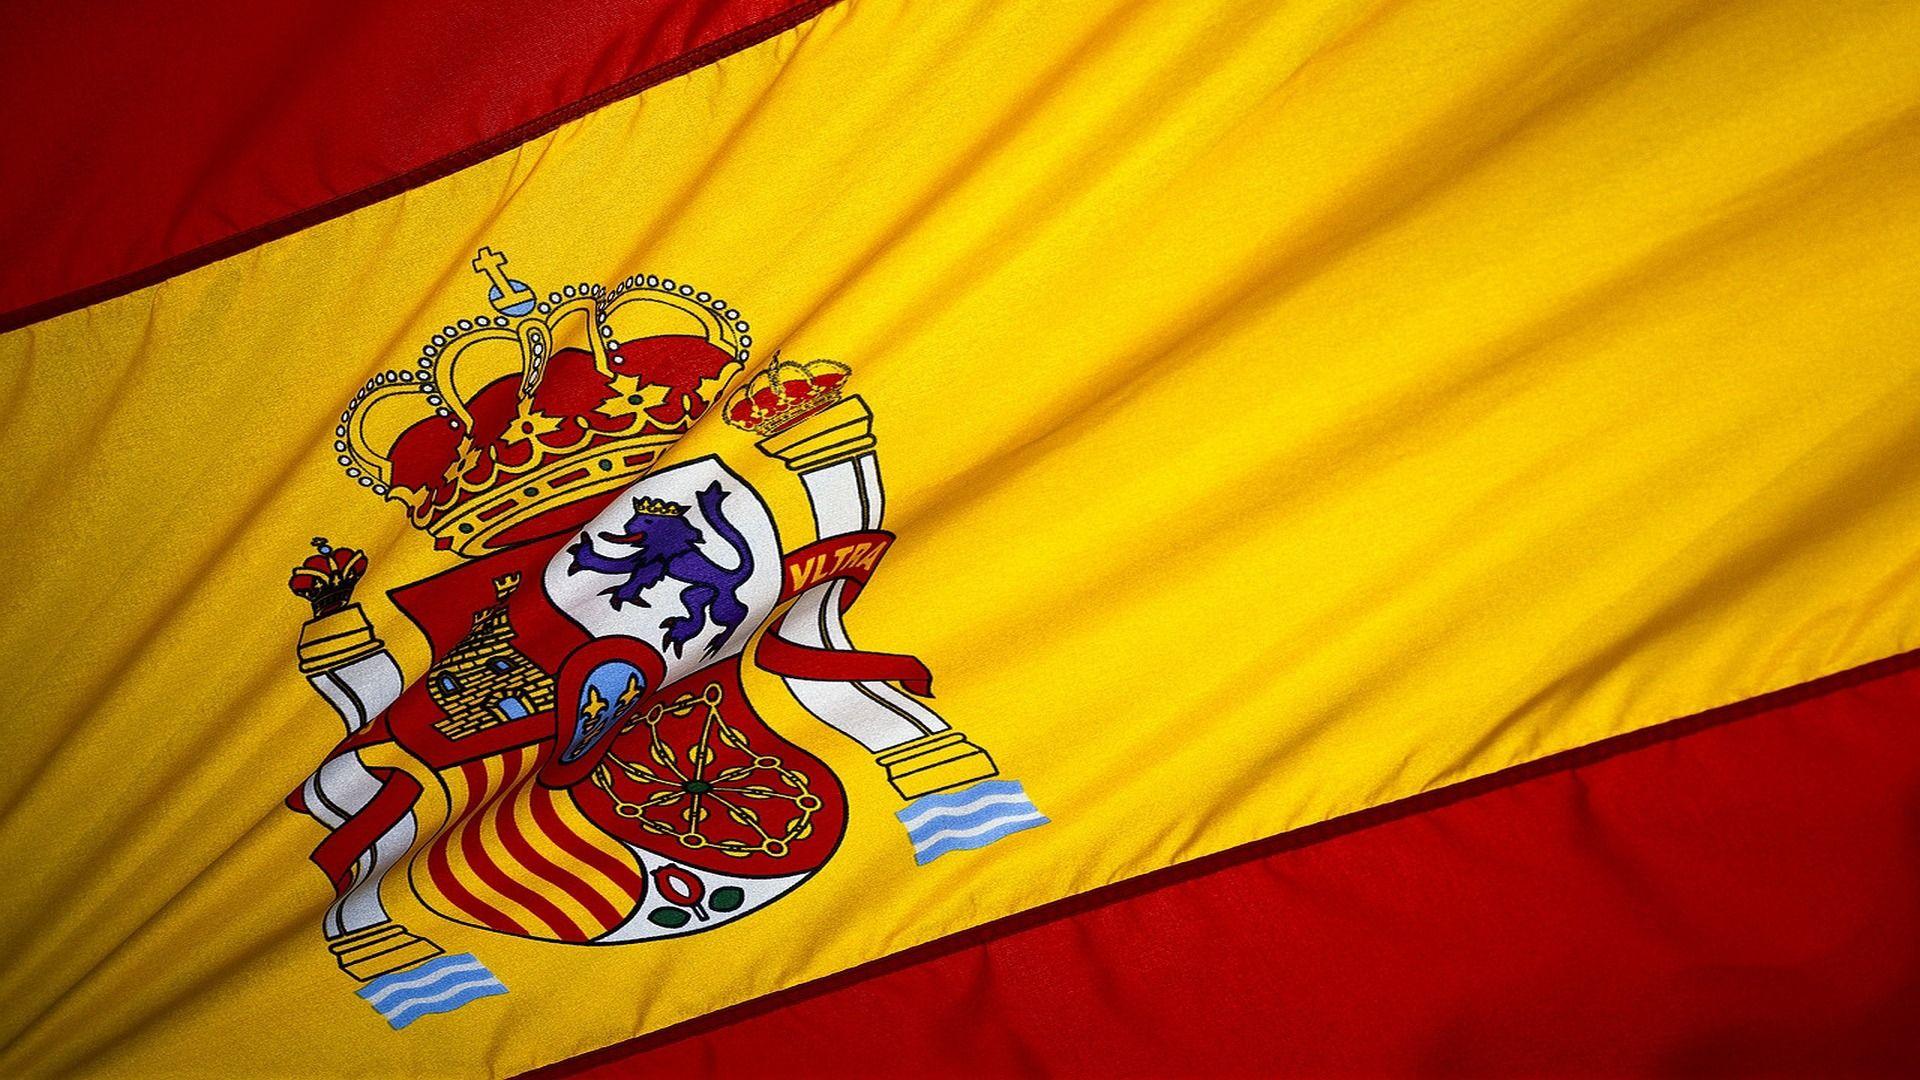 Spain Flag Hd 1080p Wallpapers Sss Spain Flag Spanish Flags